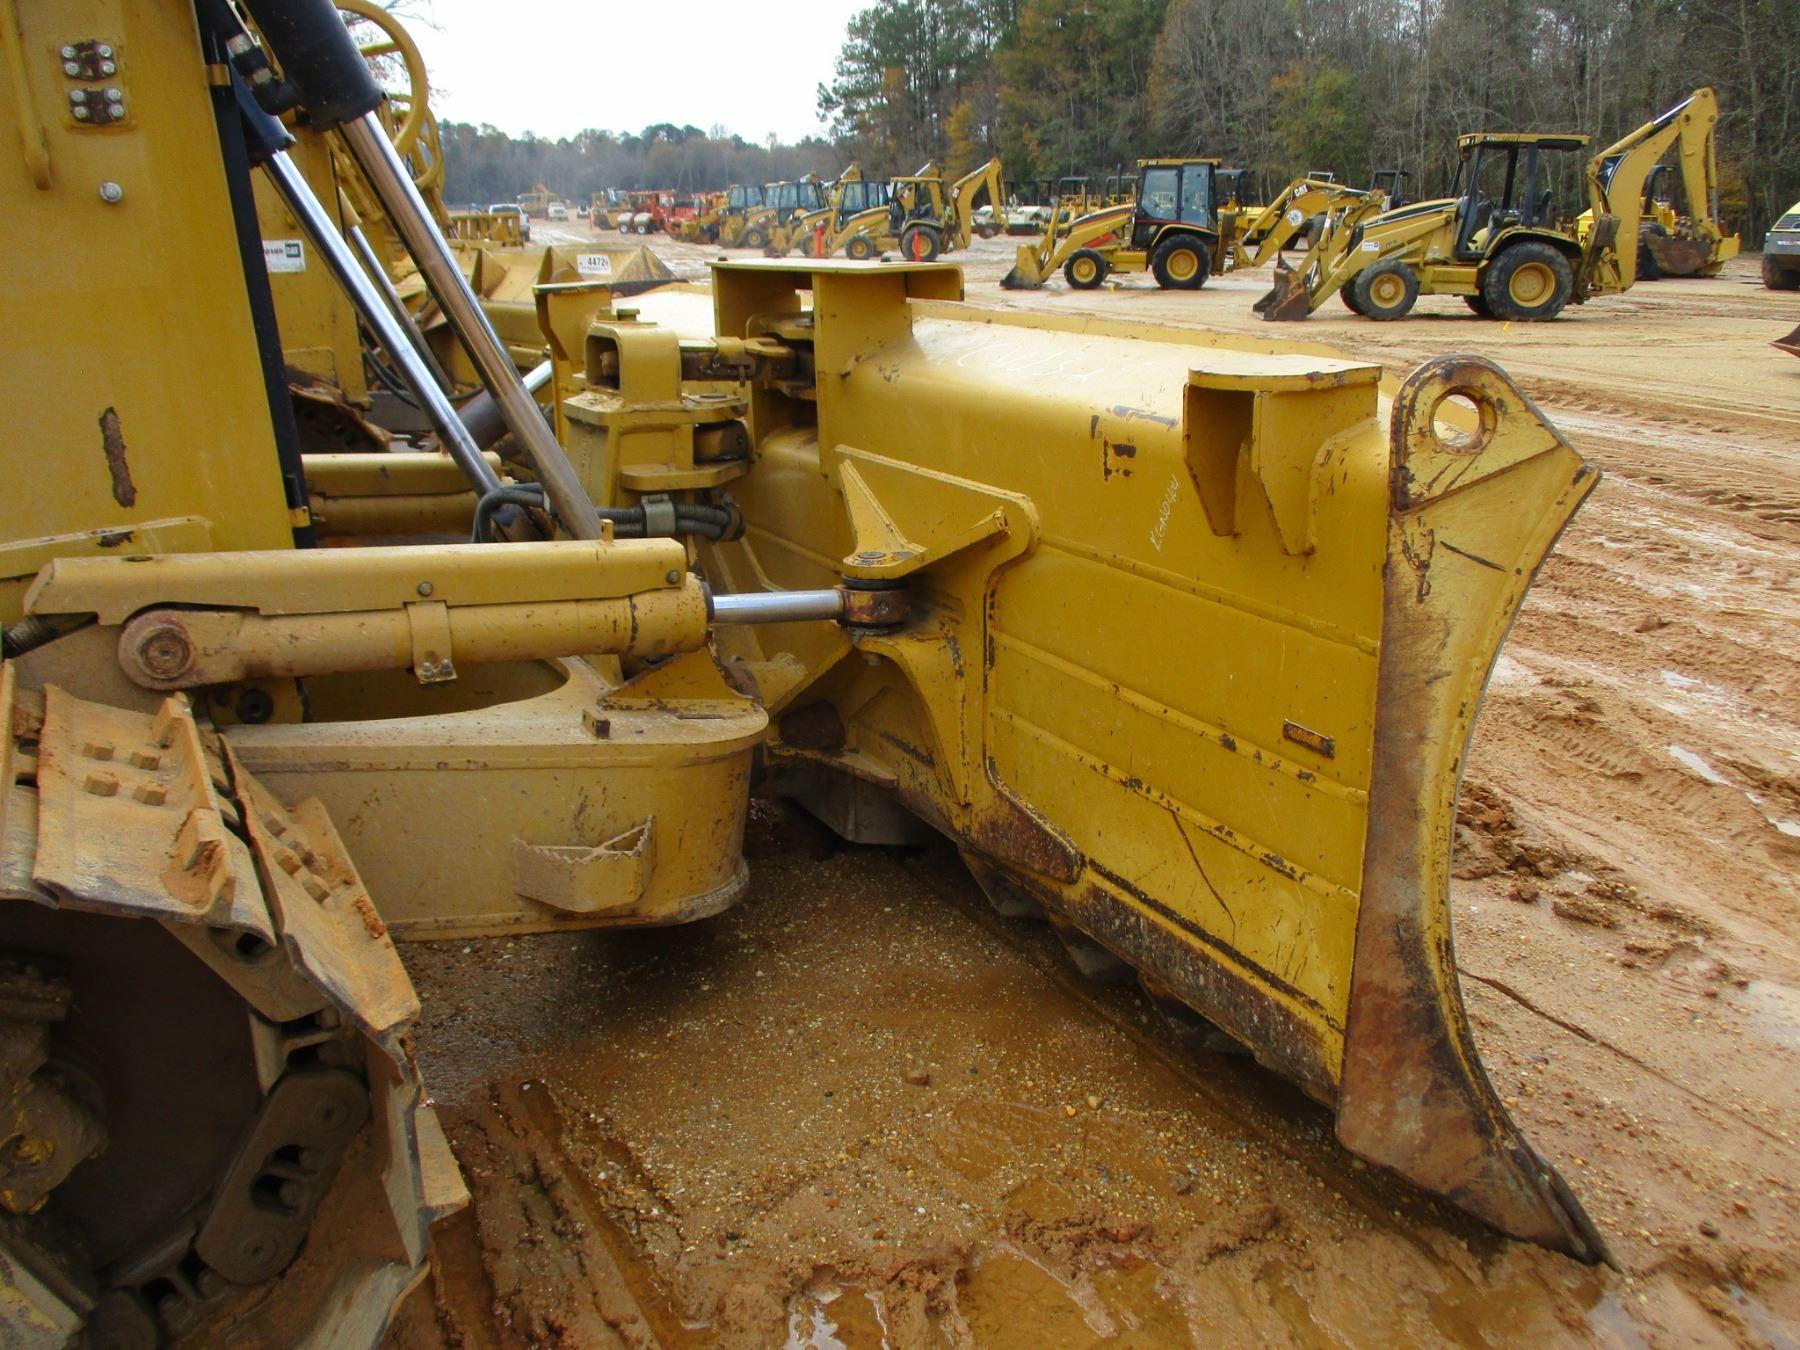 2012 CAT D6T XW CRAWLER TRACTOR, VIN/SN:RCW00328 - 6 WAY BLADE, SYSTEM 1  U/C, GRADE CONTROL, WINCH,